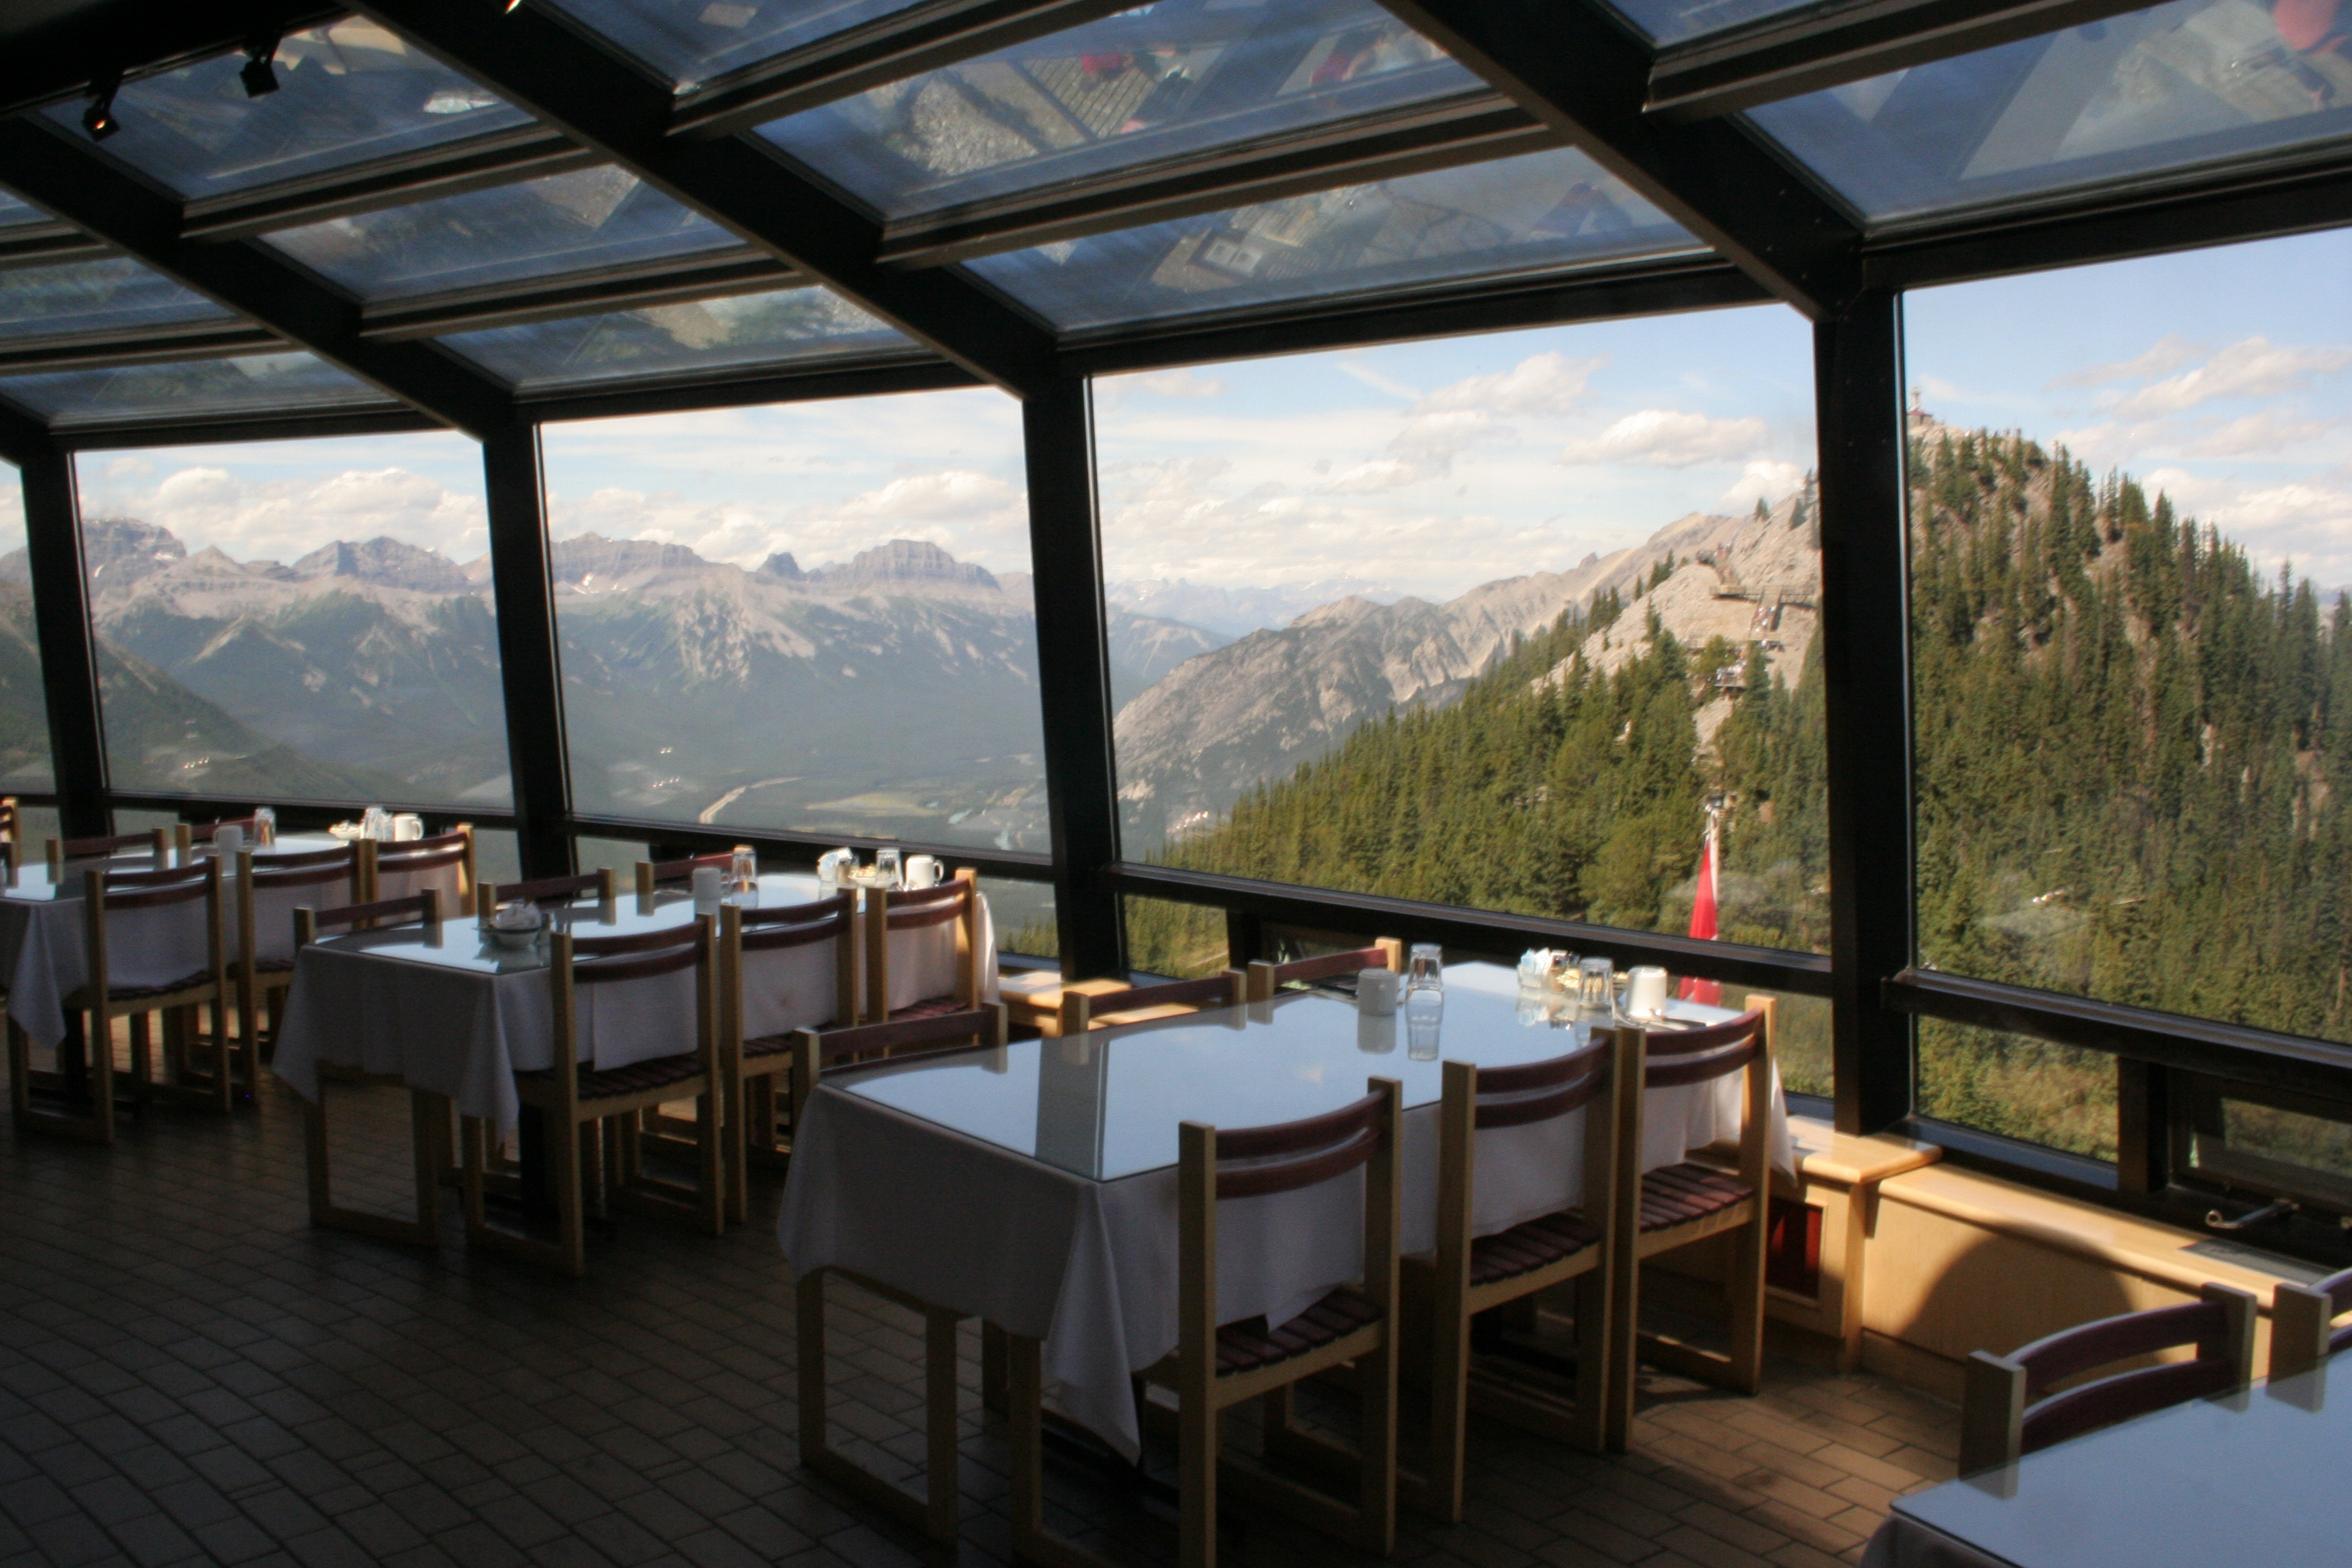 Best Italian Restaurant In Media Pa